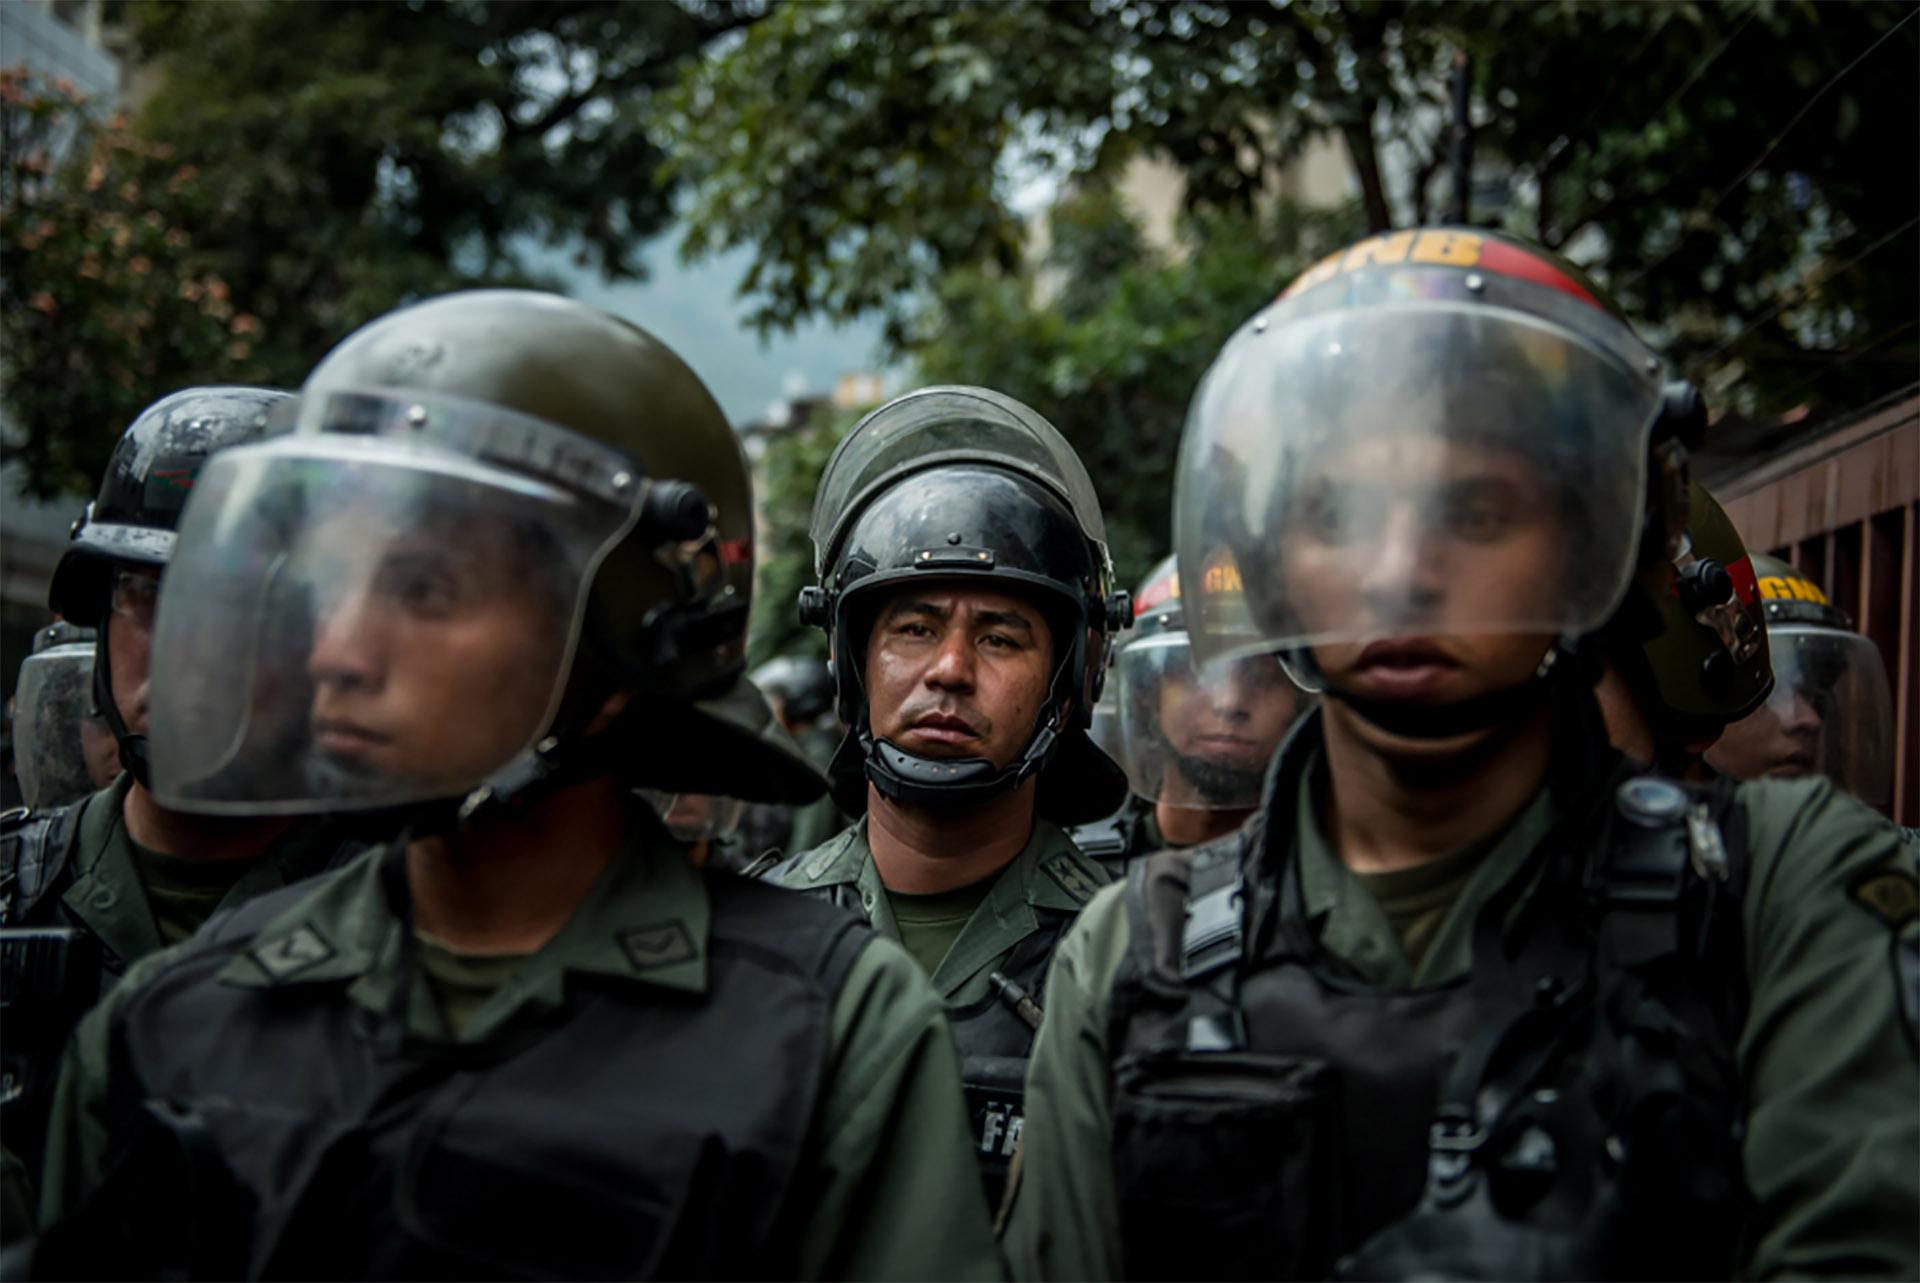 Agentes de la Guardia Nacional Bolivariana (policía militarizada) (Meridith Kohut for The New York Times)